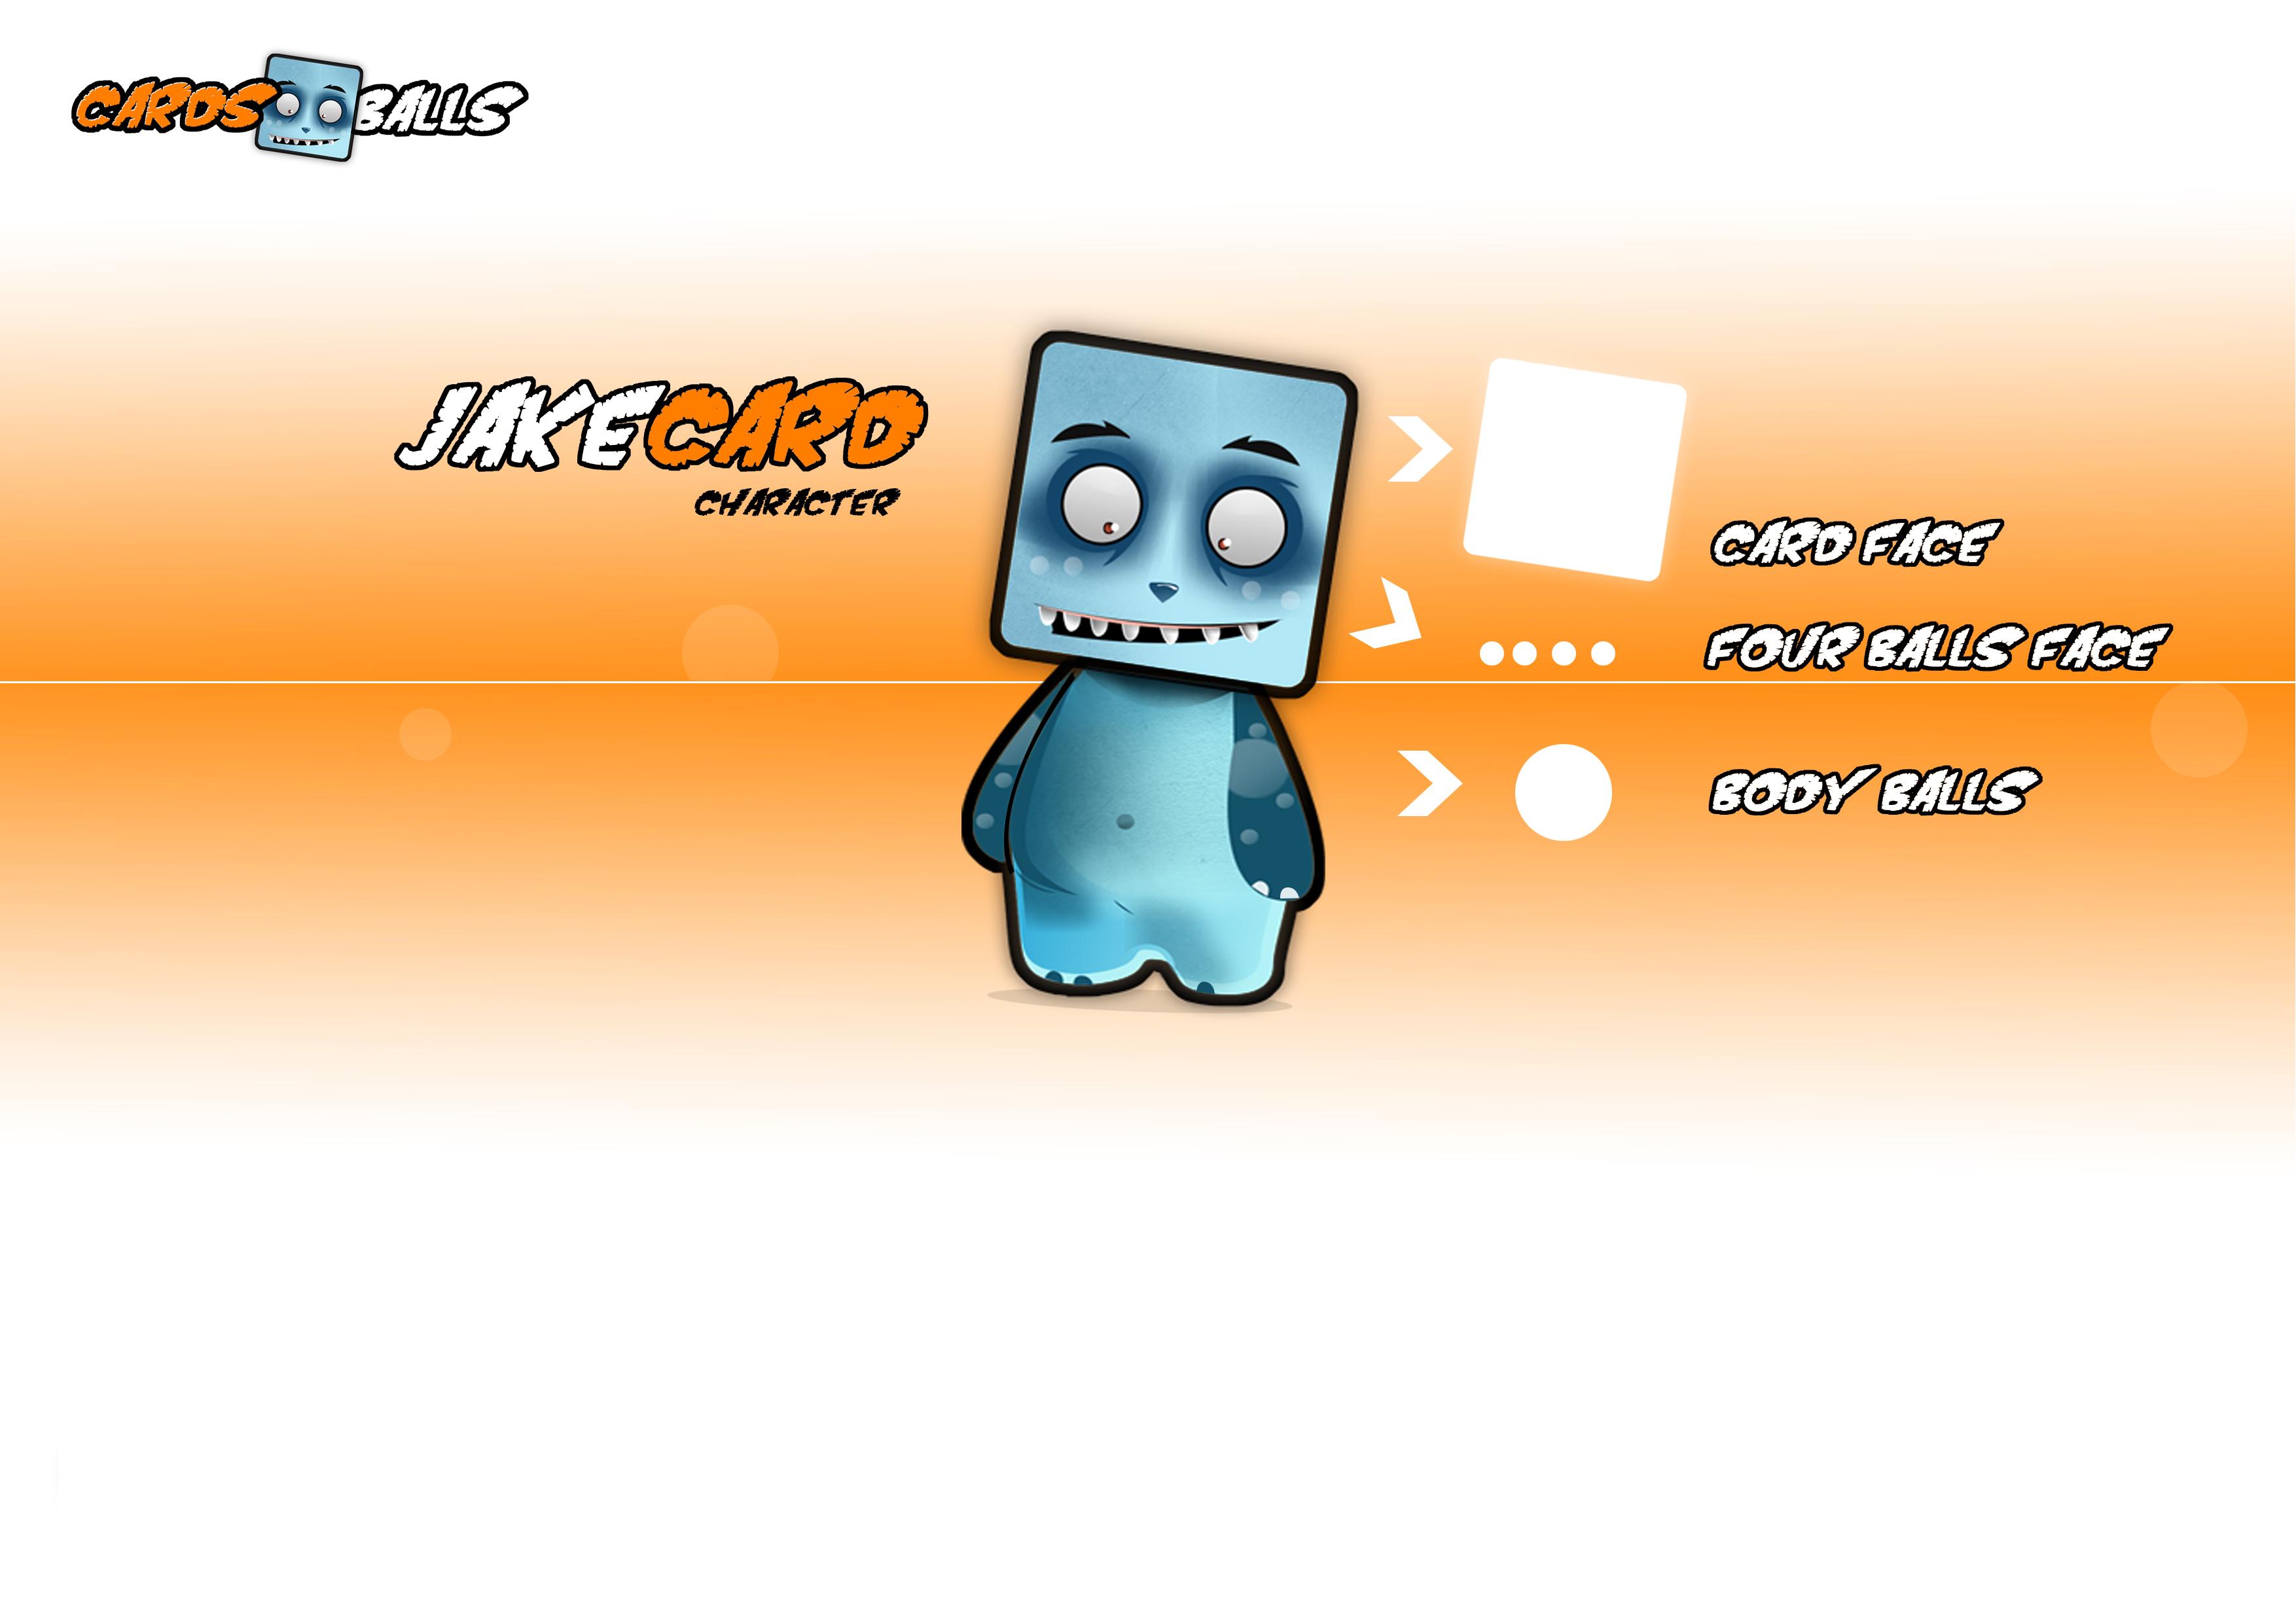 04 jack card.jpg